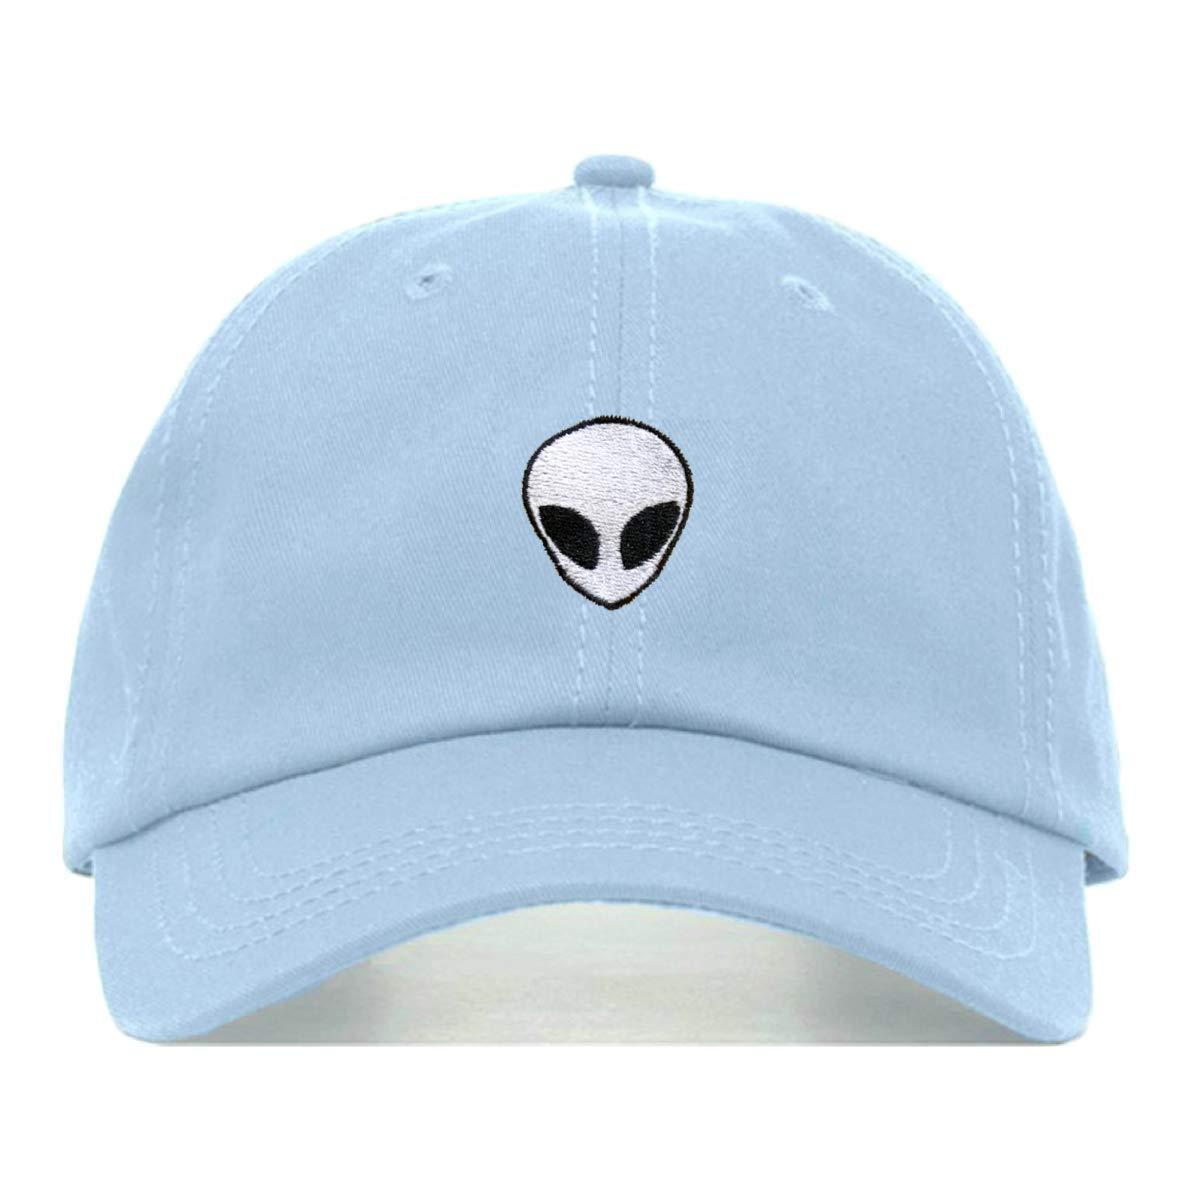 a74f0fd7218 Amazon.com  Alien Dad Hat